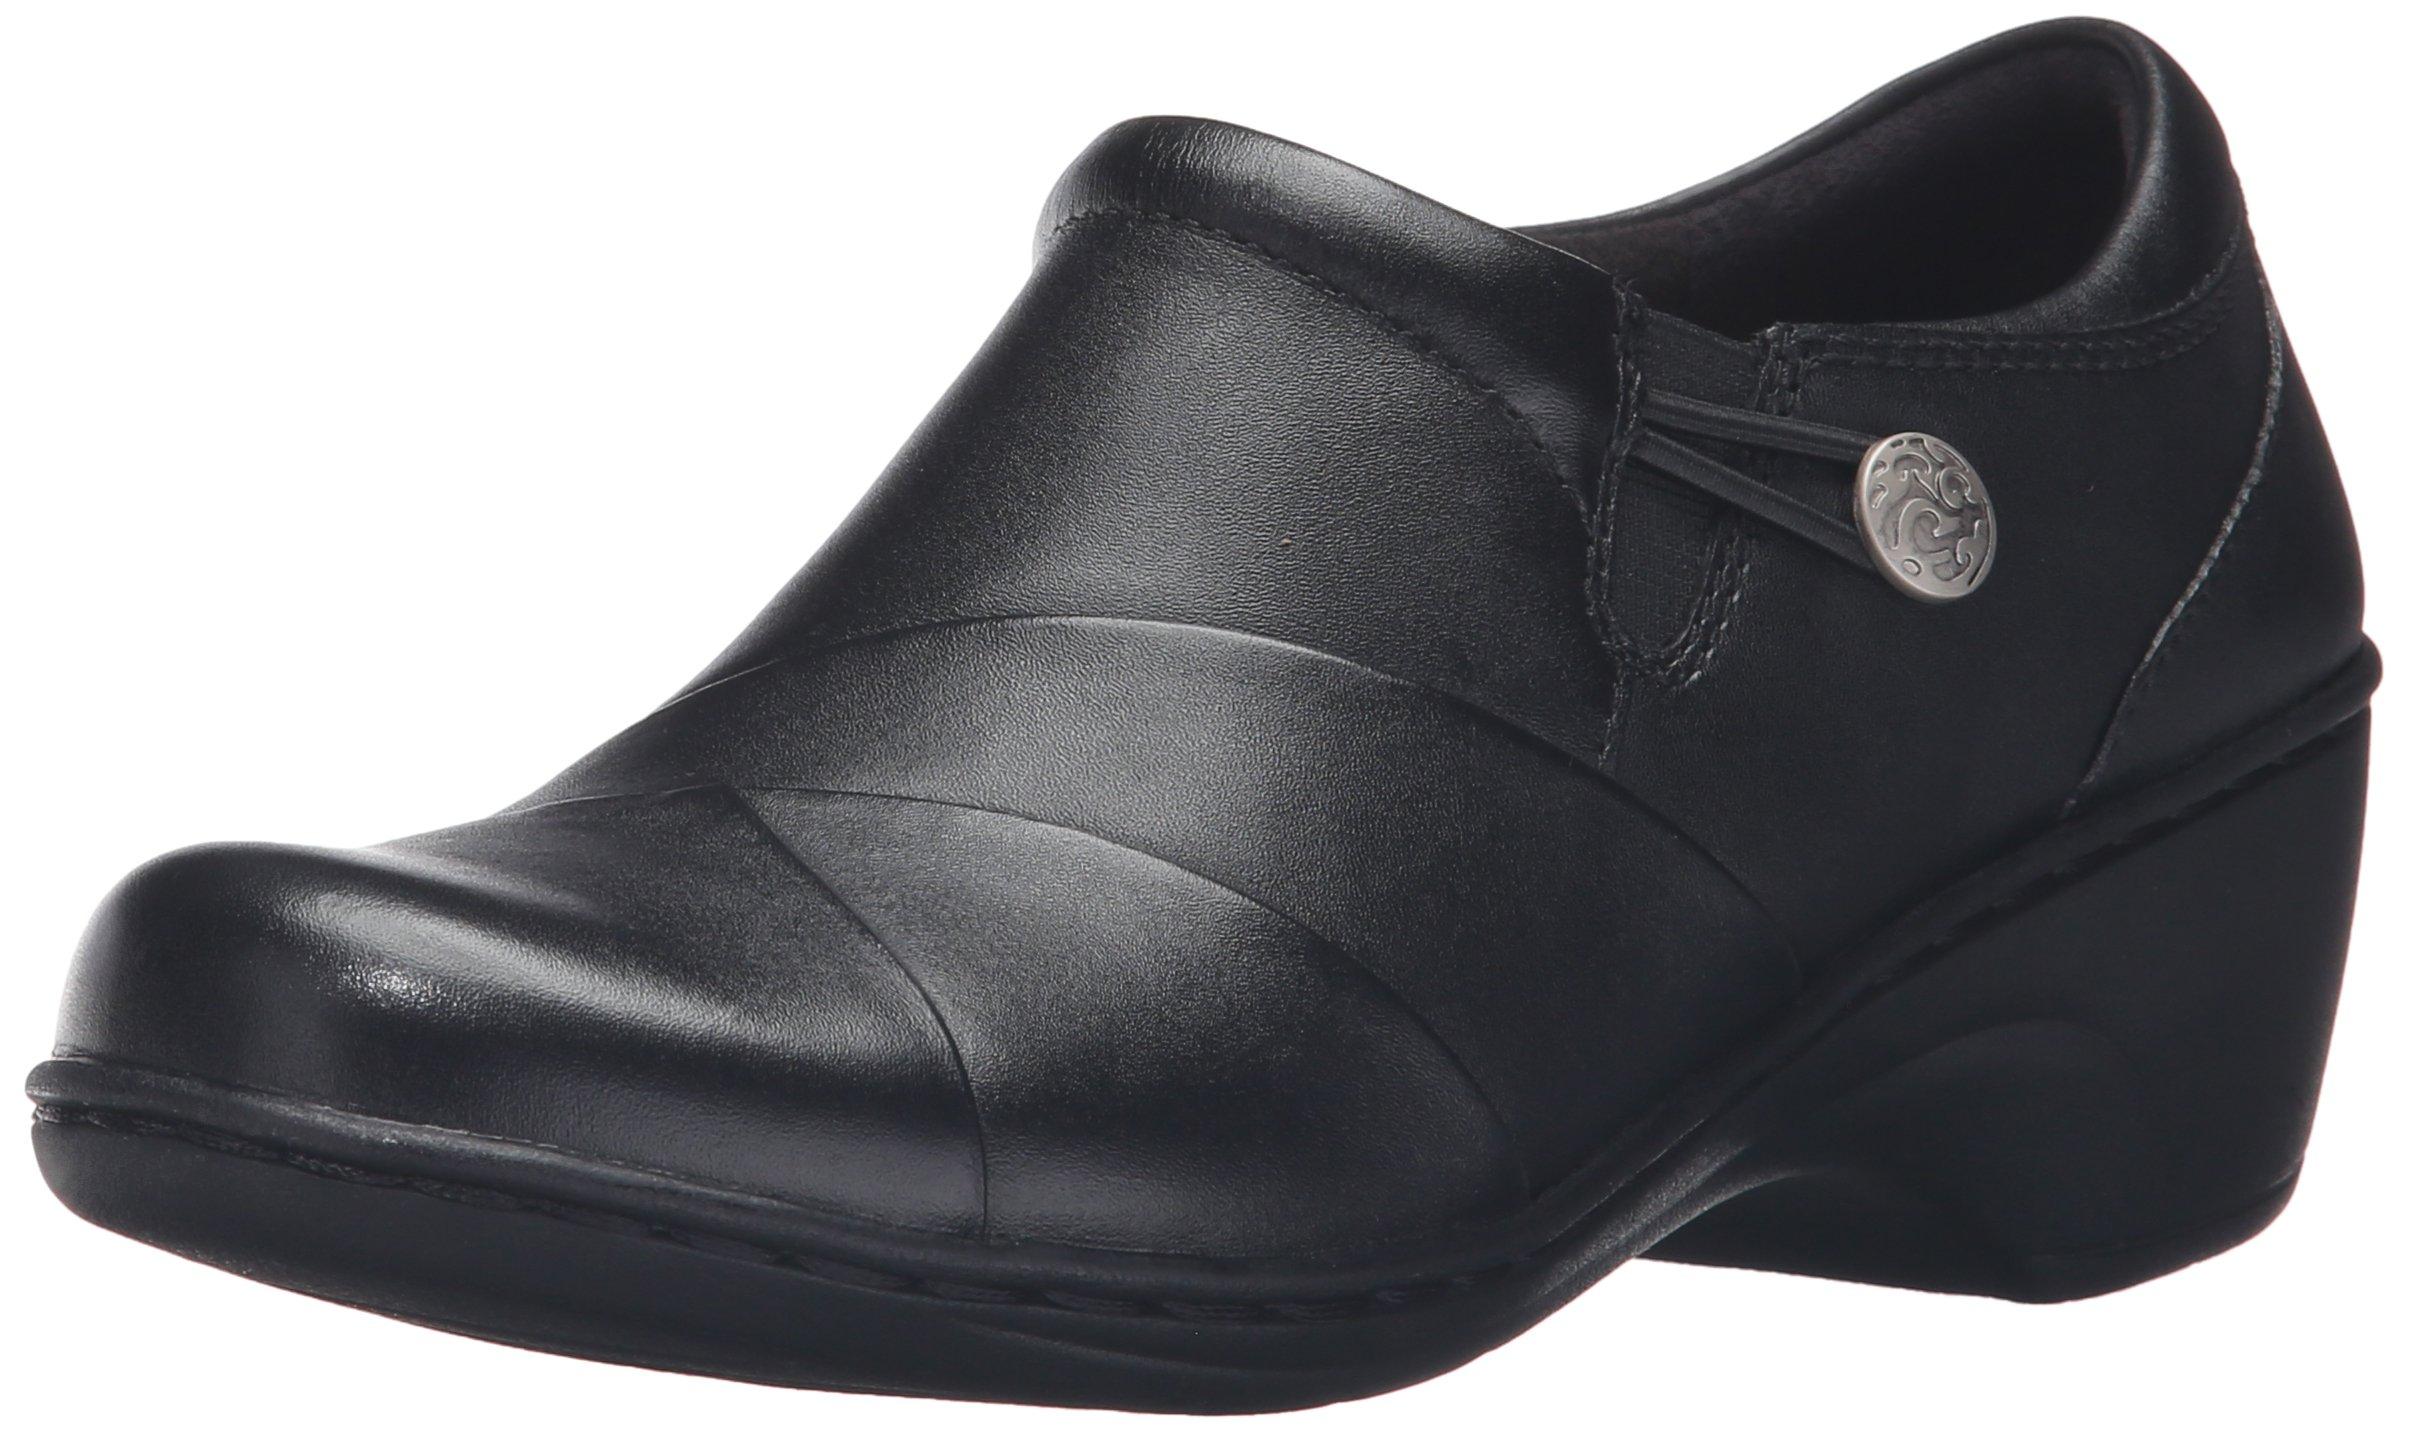 CLARKS Women's Channing Ann Slip-On Loafer, Black Leather, 9 M US